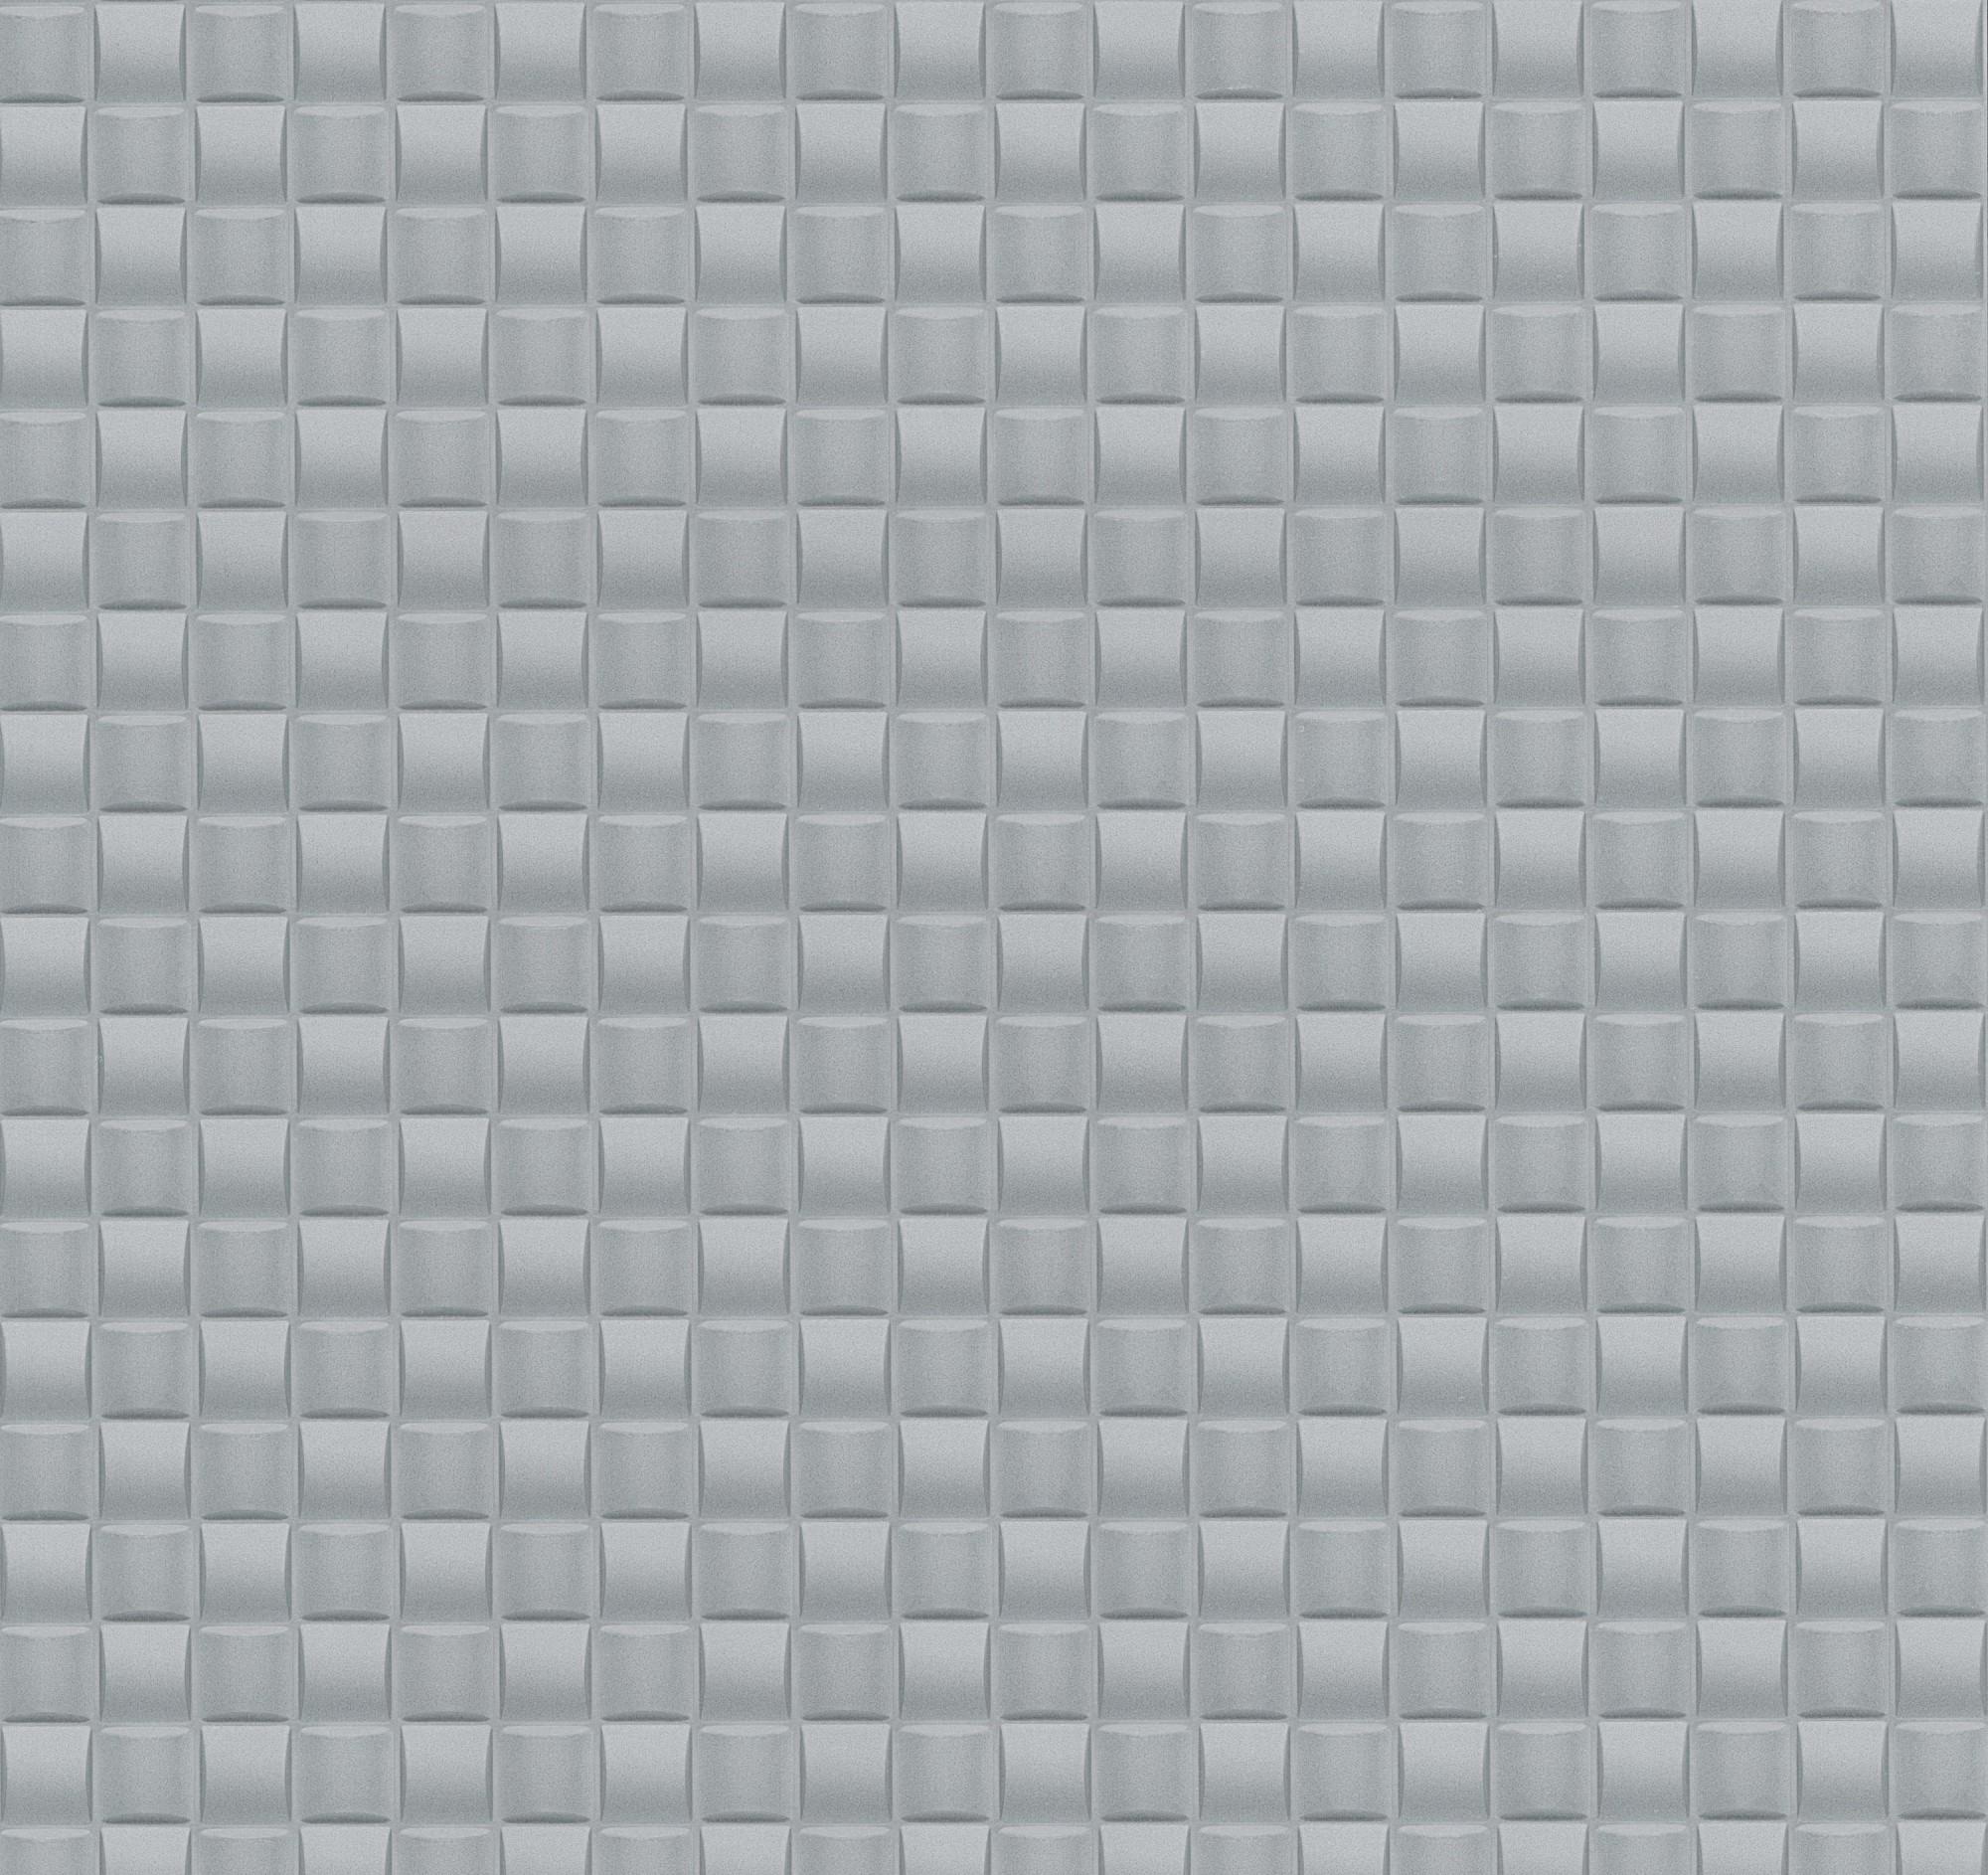 guido maria kretschmer tapete grau kachel 02468 30. Black Bedroom Furniture Sets. Home Design Ideas